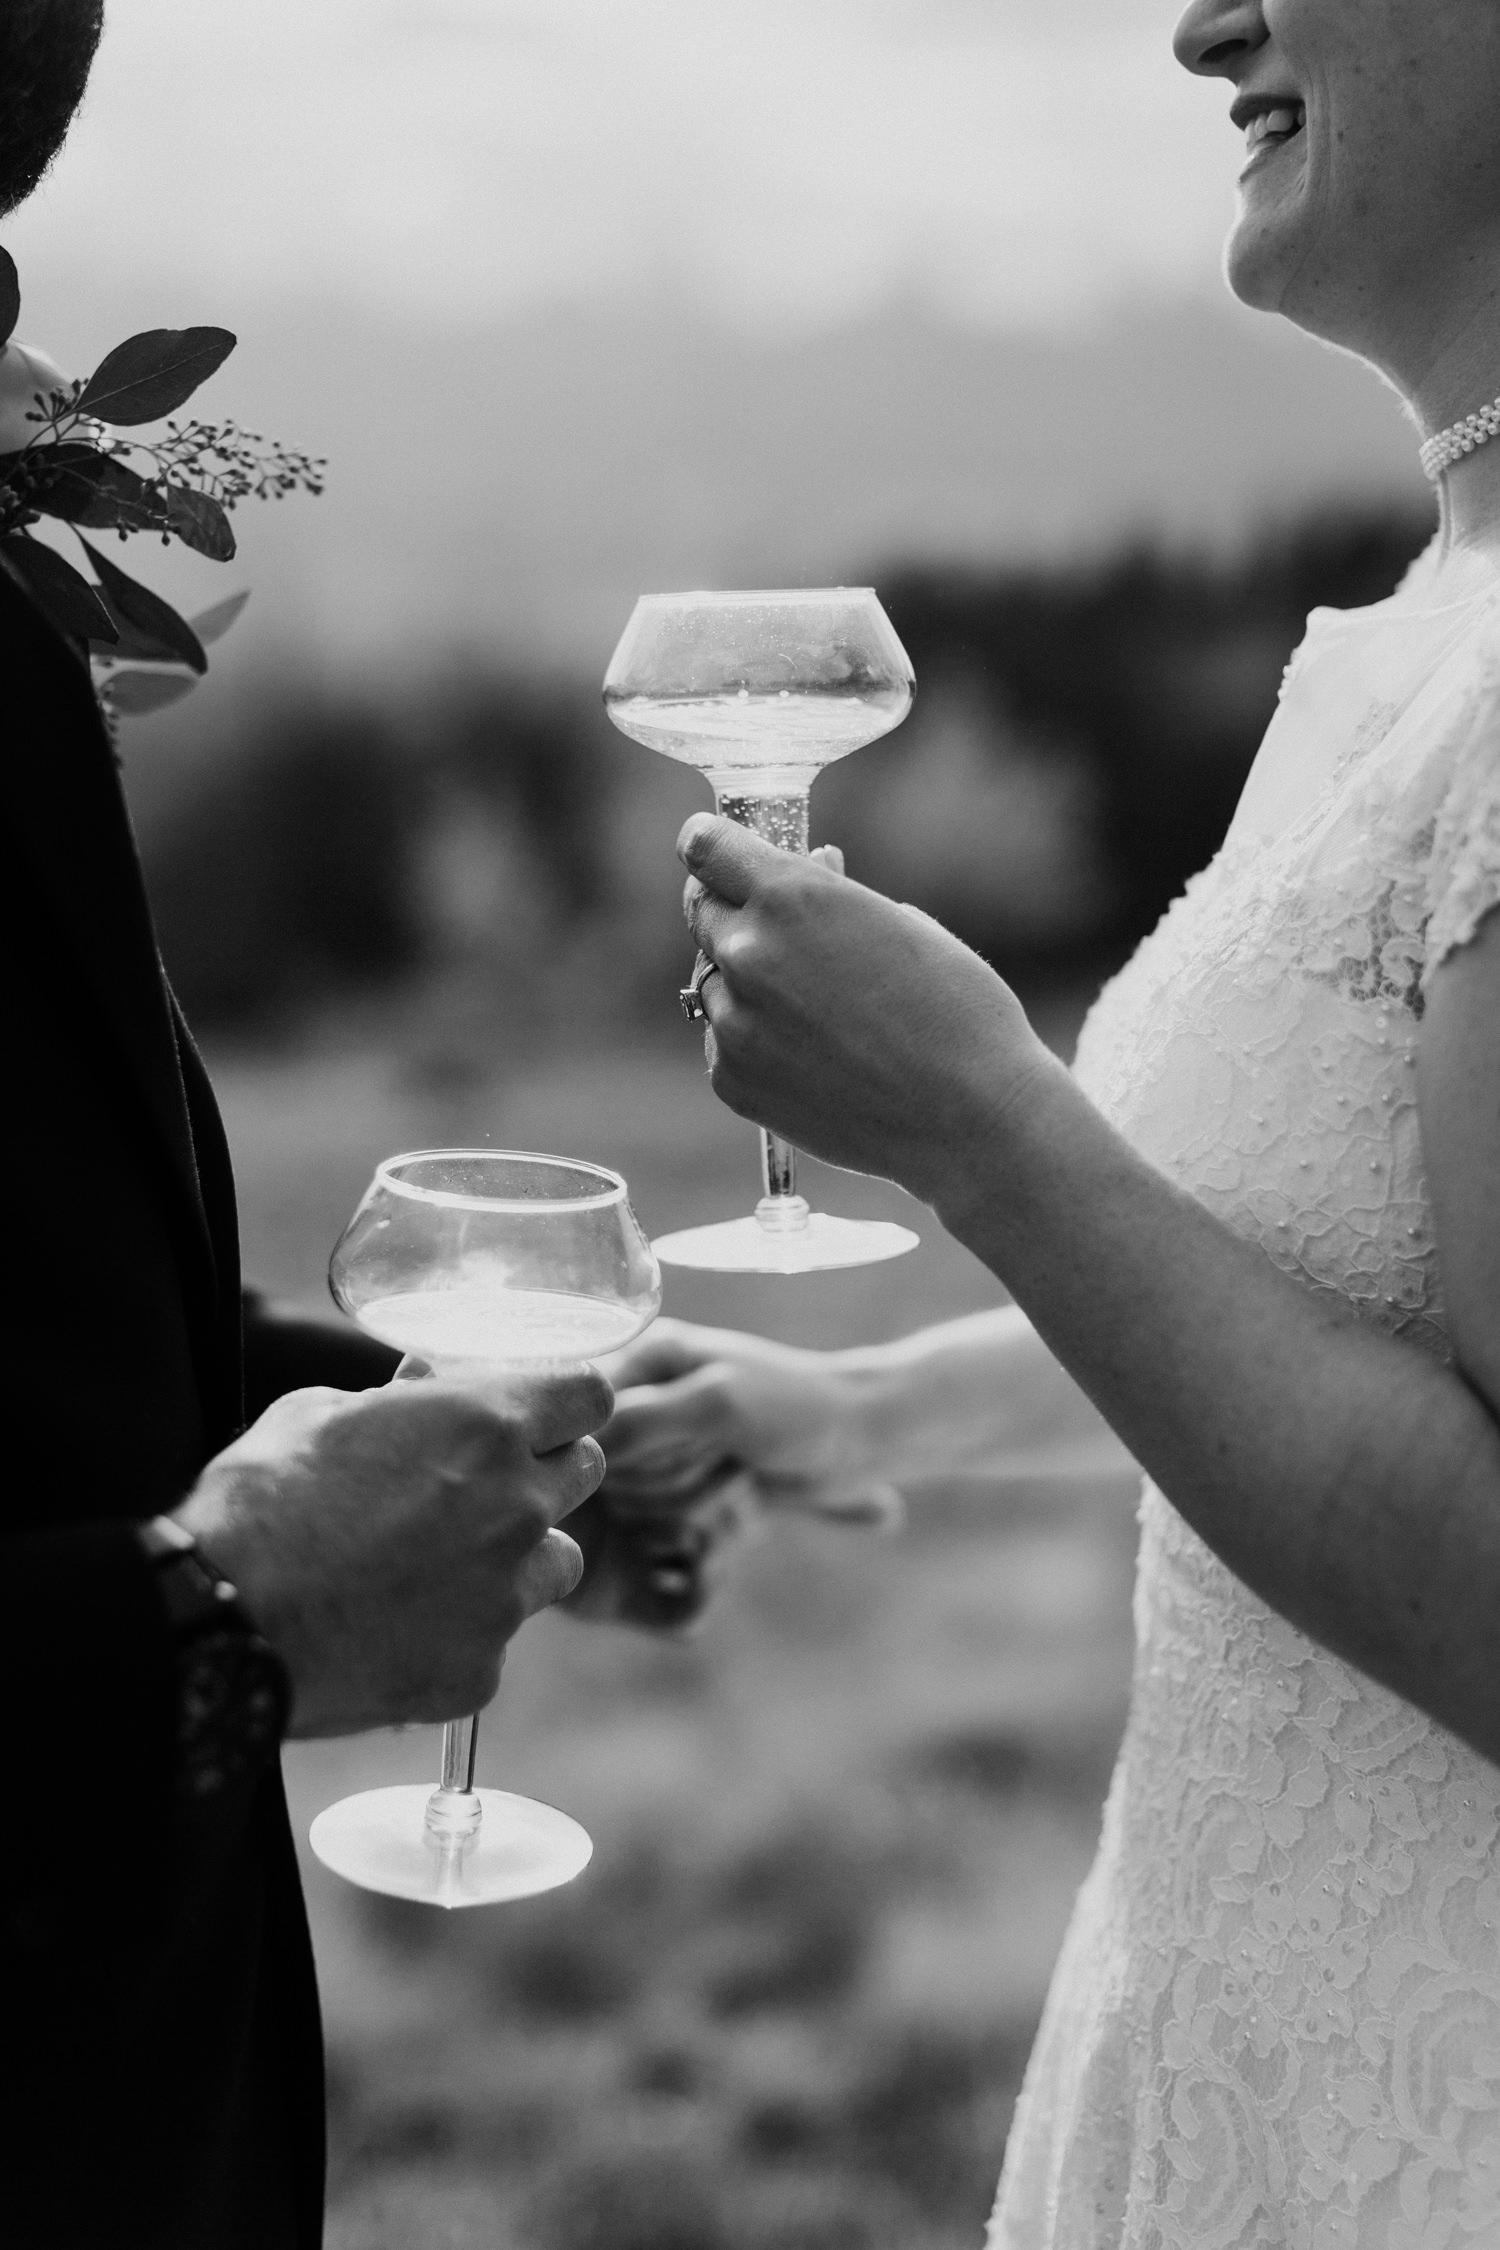 colorado-elopement-photographer-buena-vista-33.jpg